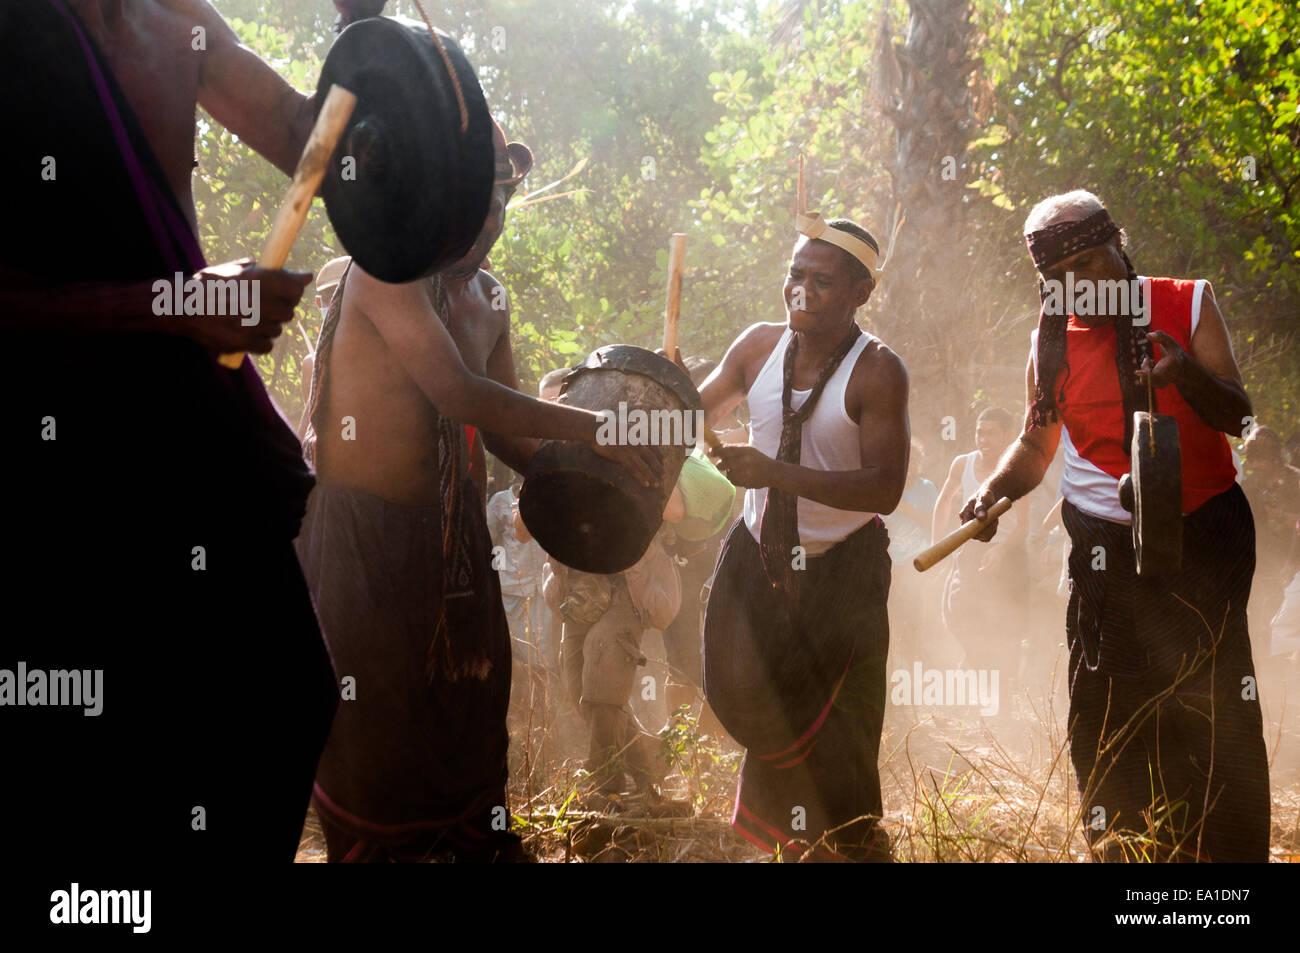 Local people play traditional drums at Lewotolok village, Lembata Island, Indonesia. © Reynold Sumayku - Stock Image